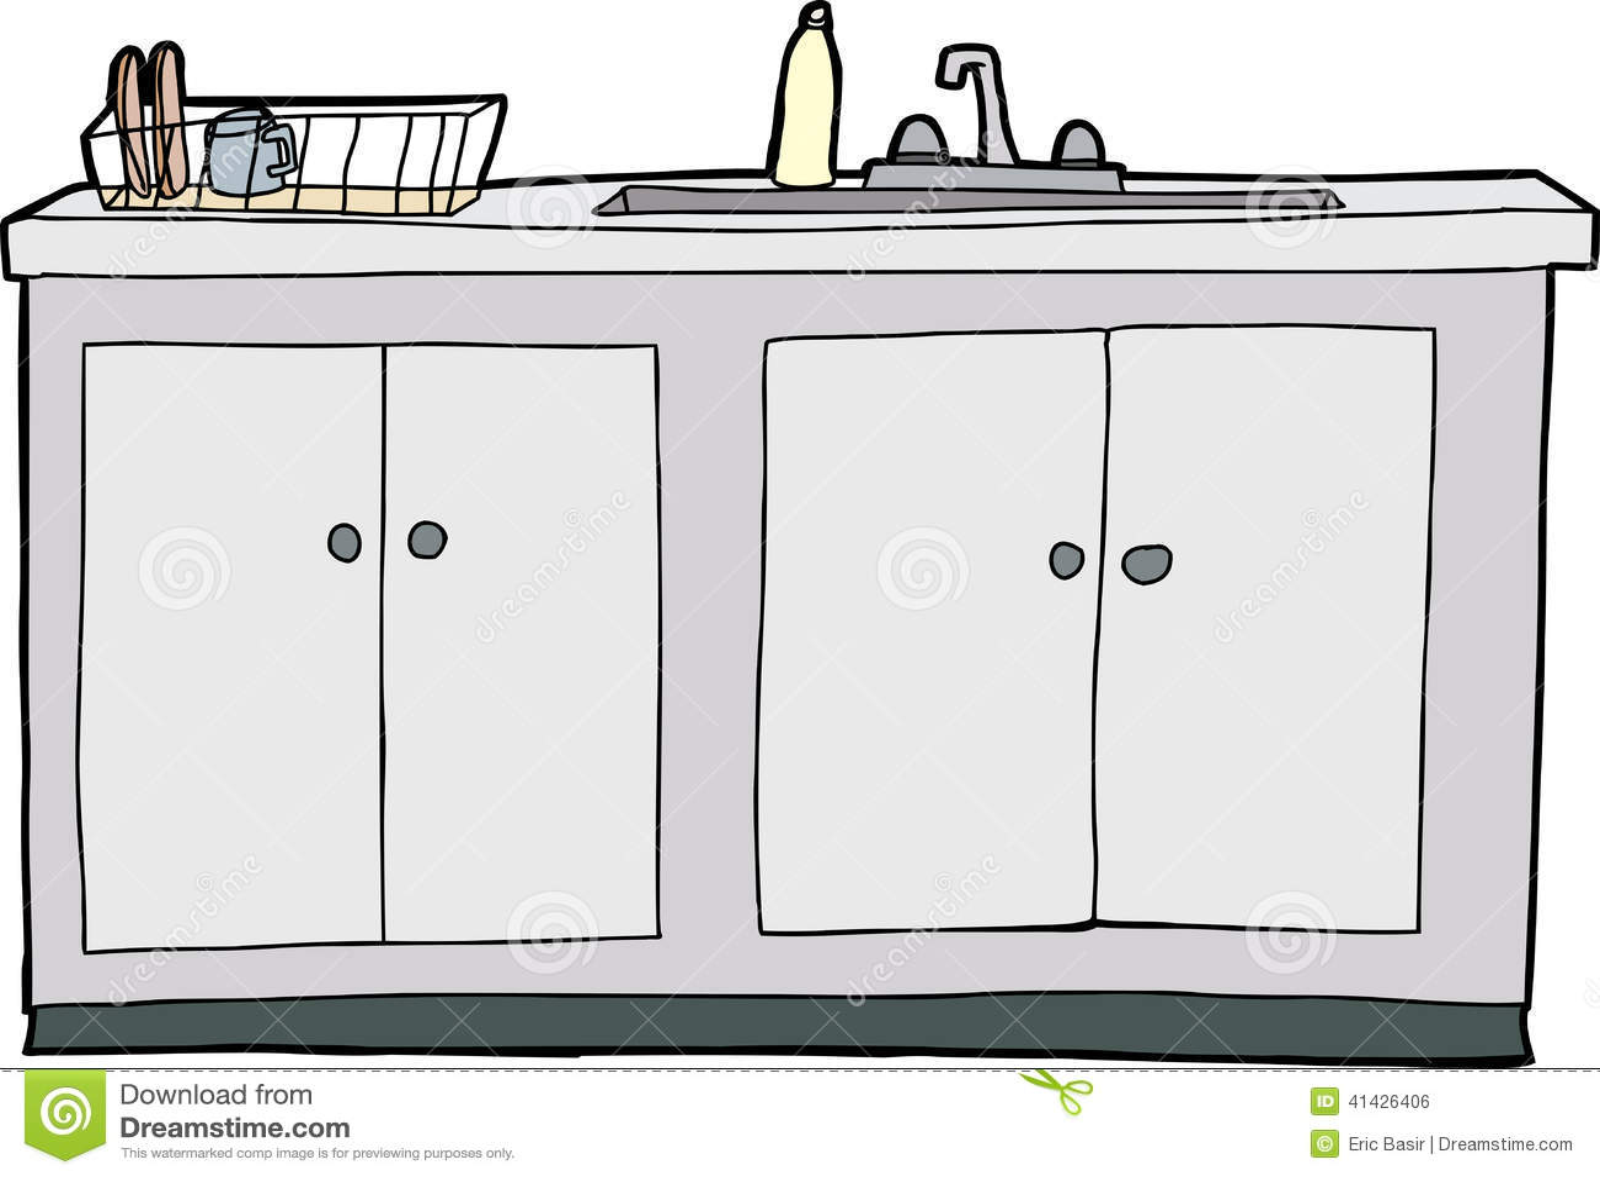 Drying Rack Kitchen Sink